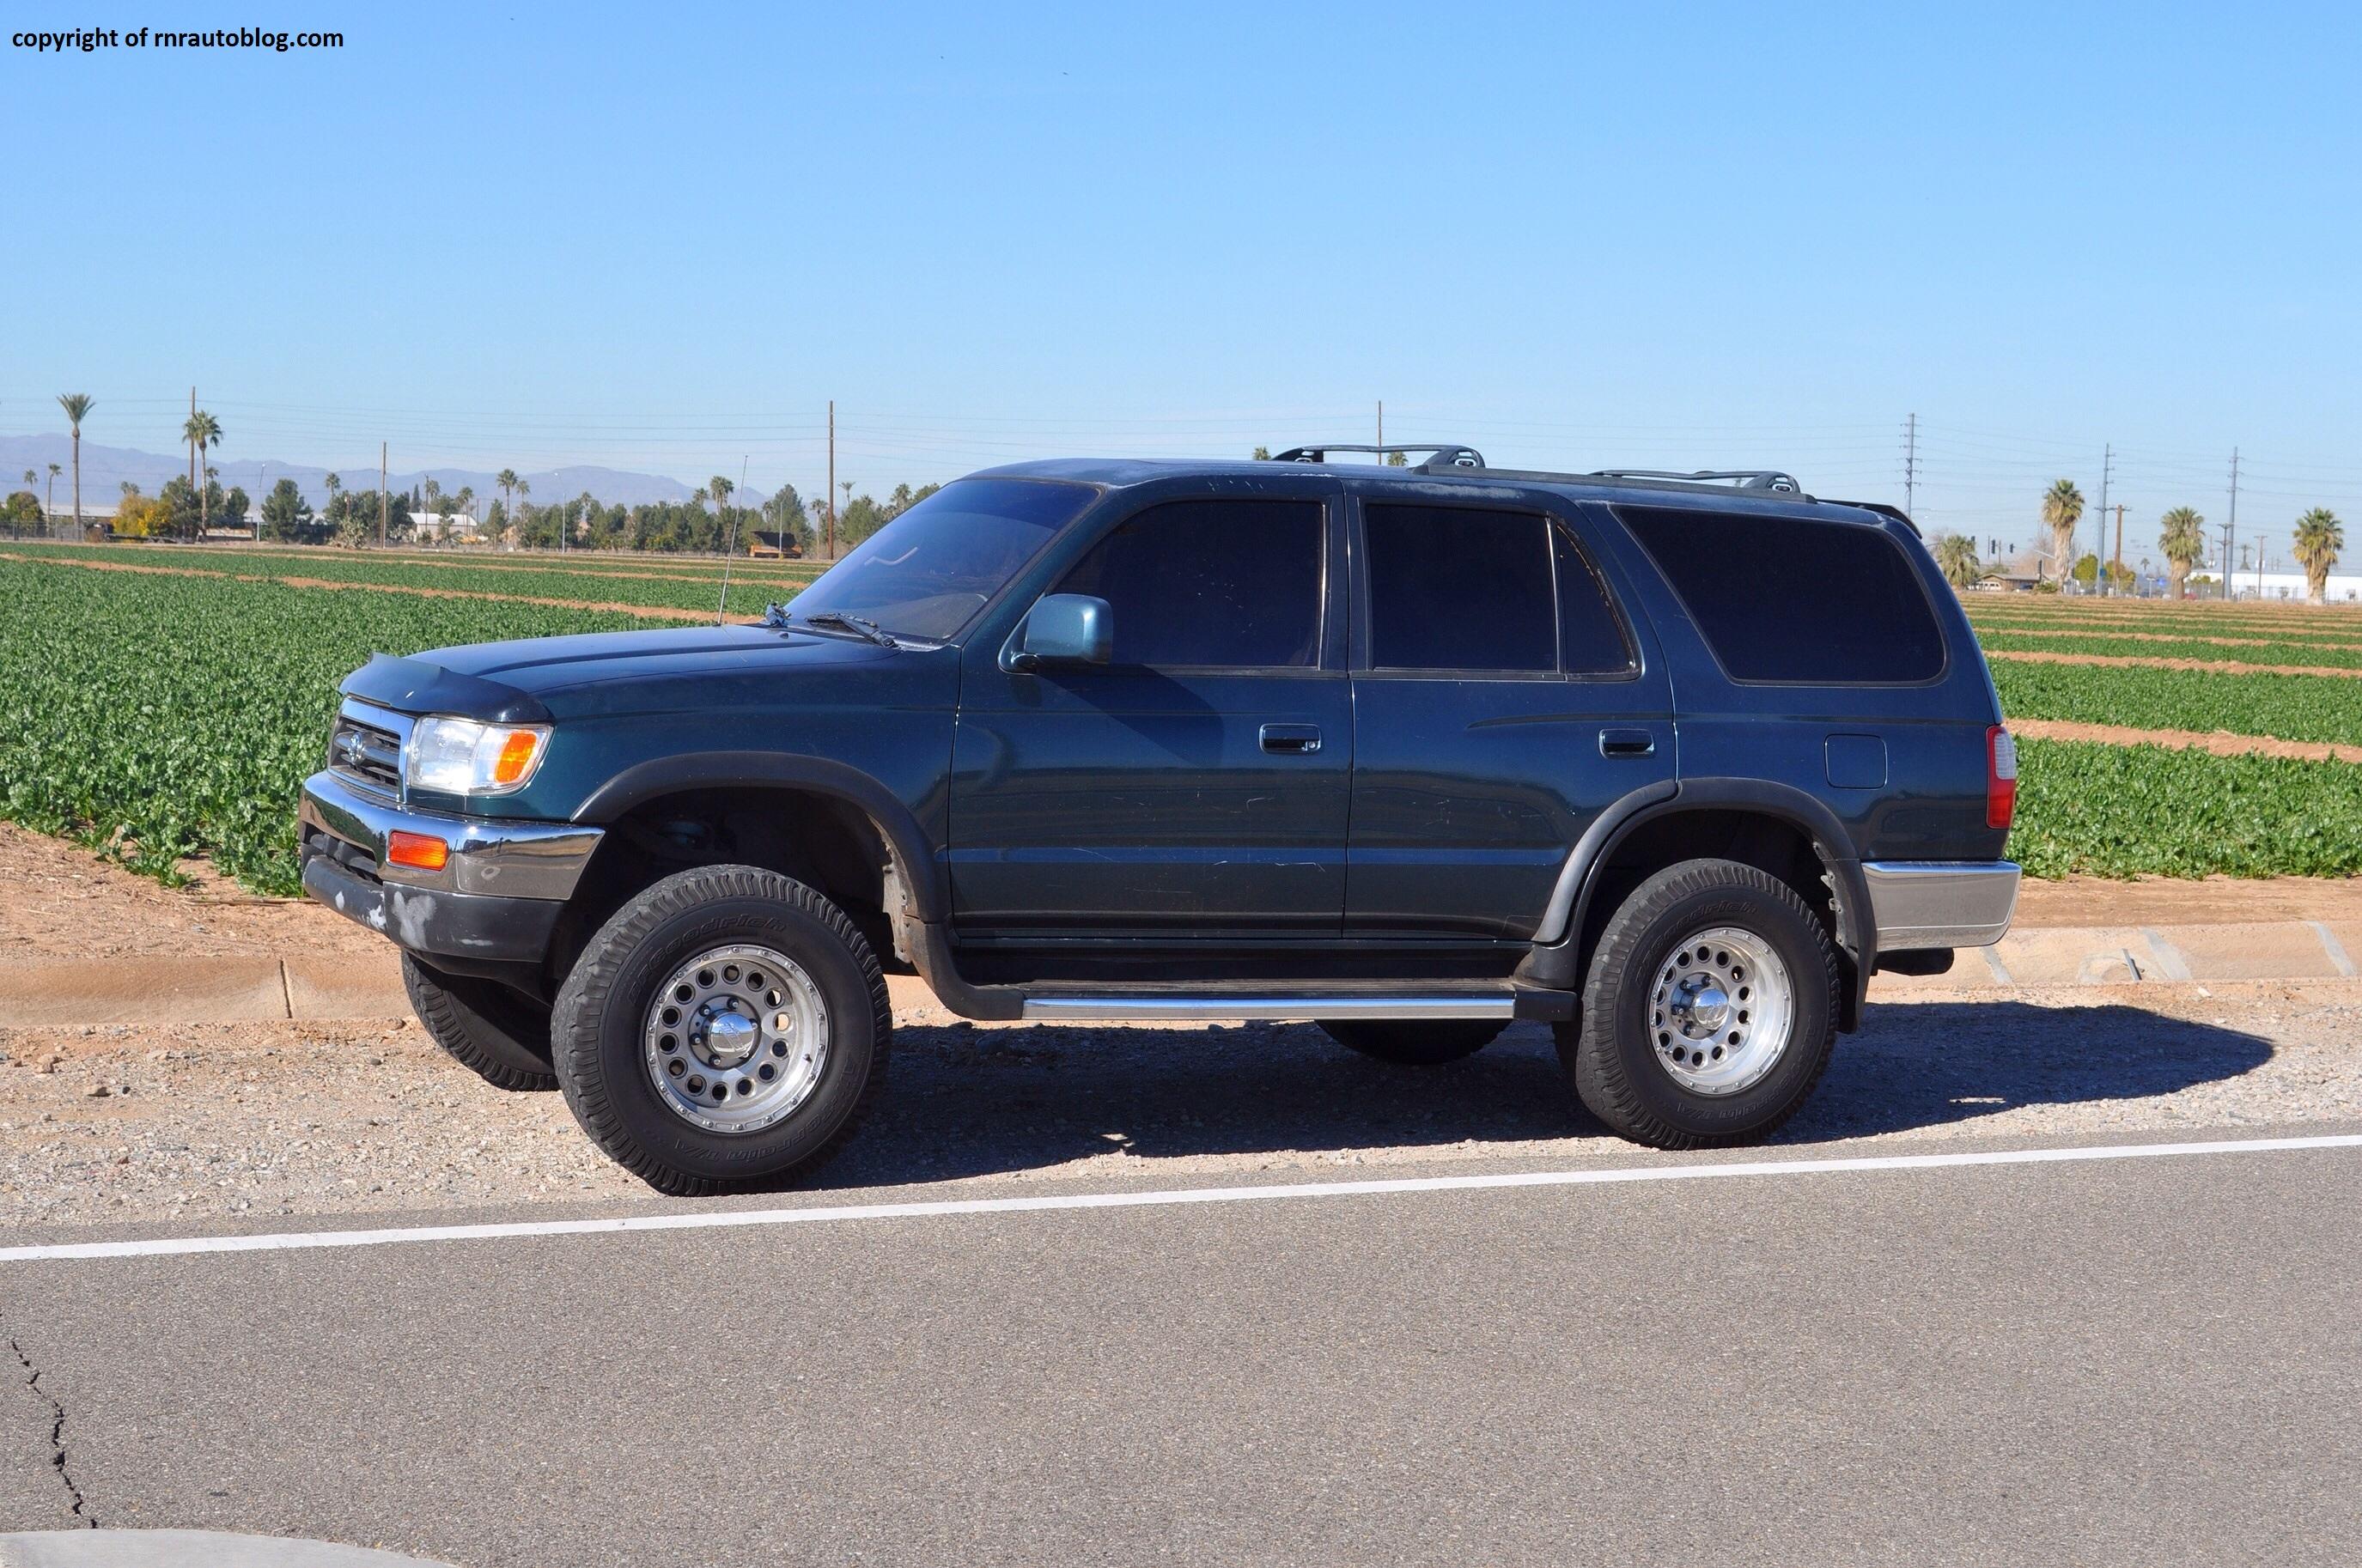 1997 toyota 4runner sr5 review rnr automotive blog 1997 toyota 4runner sr5 review rnr